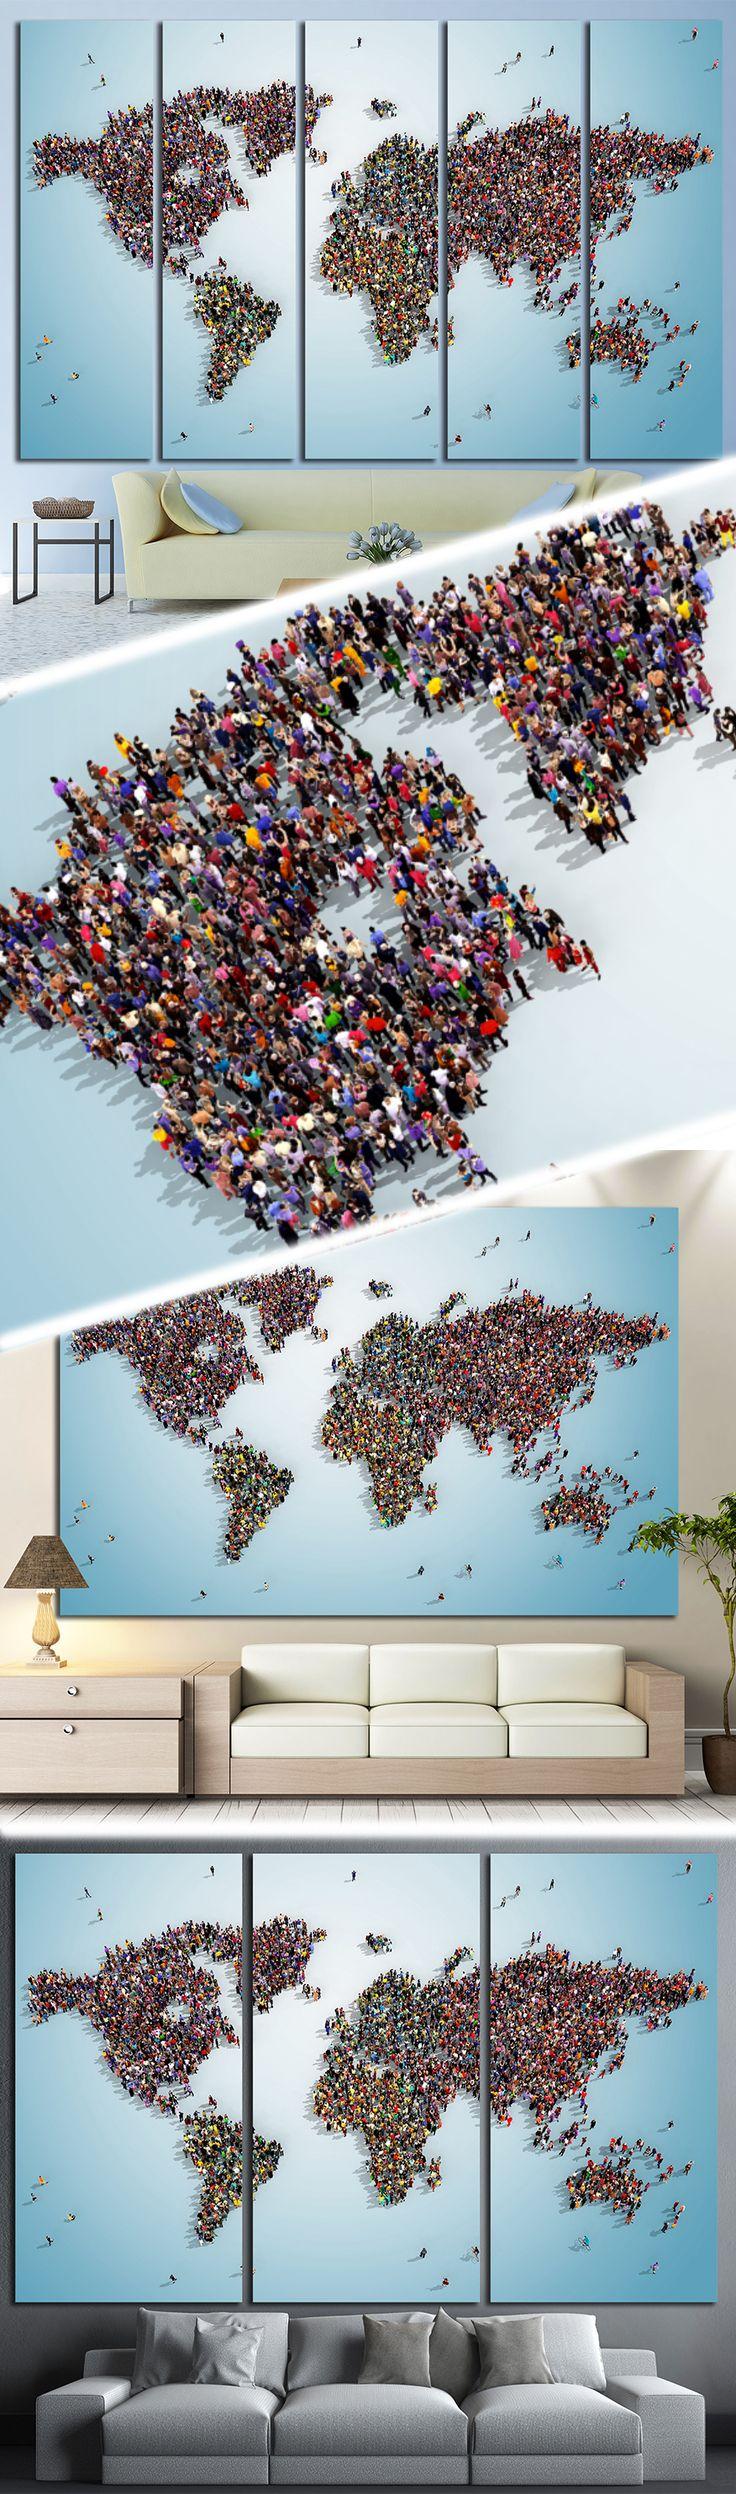 world map with bluish background 1325 Framed